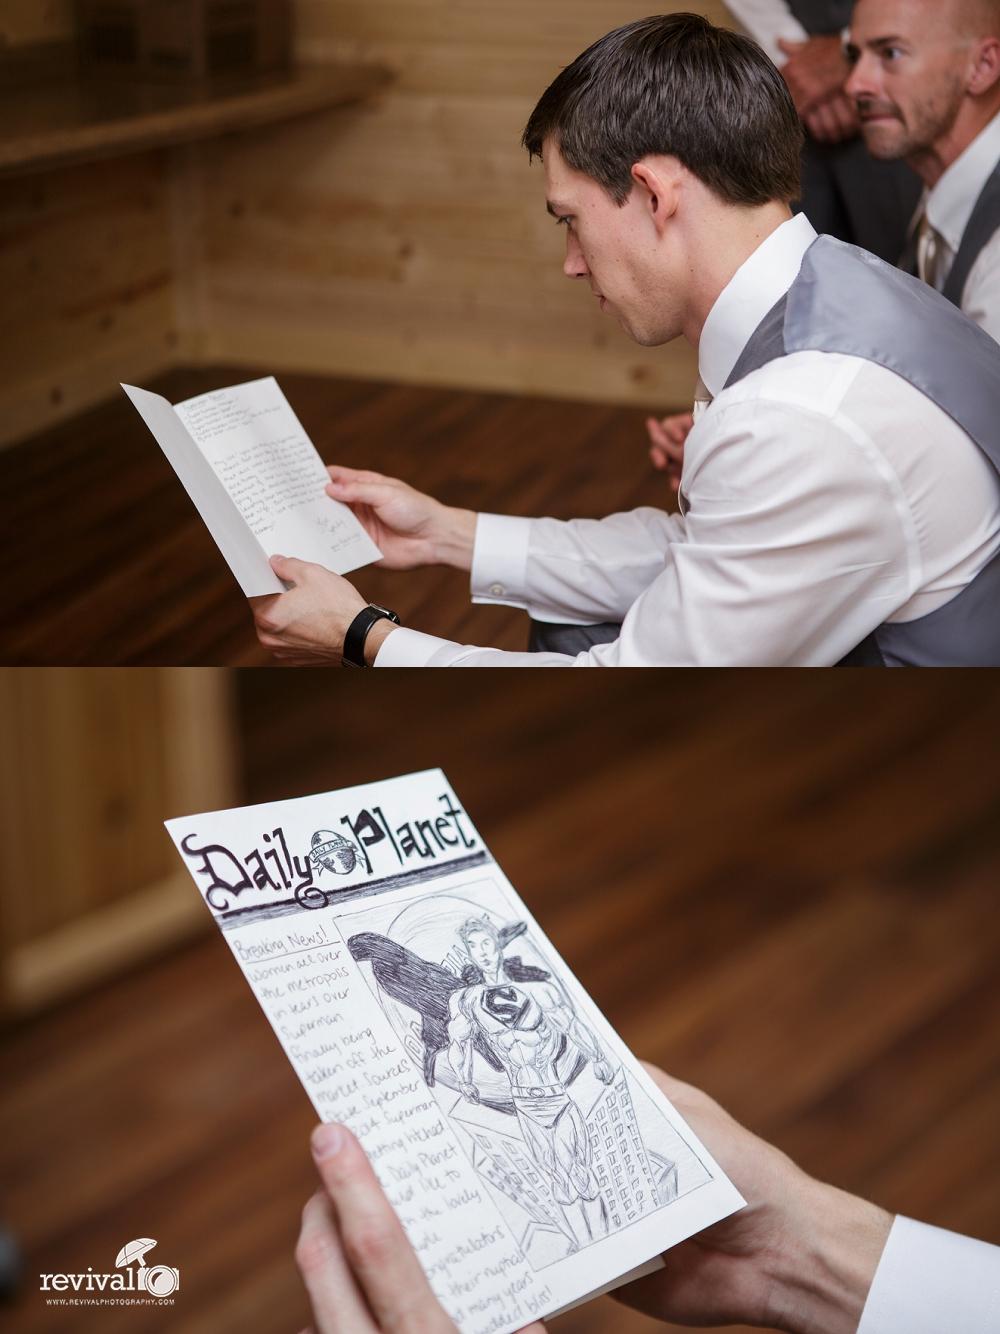 bride groom wedding day giftnote exchange faq wedding gift for groom Ideas for Bride Groom Wedding Day Gift Note Exchanges www revivalphotography com